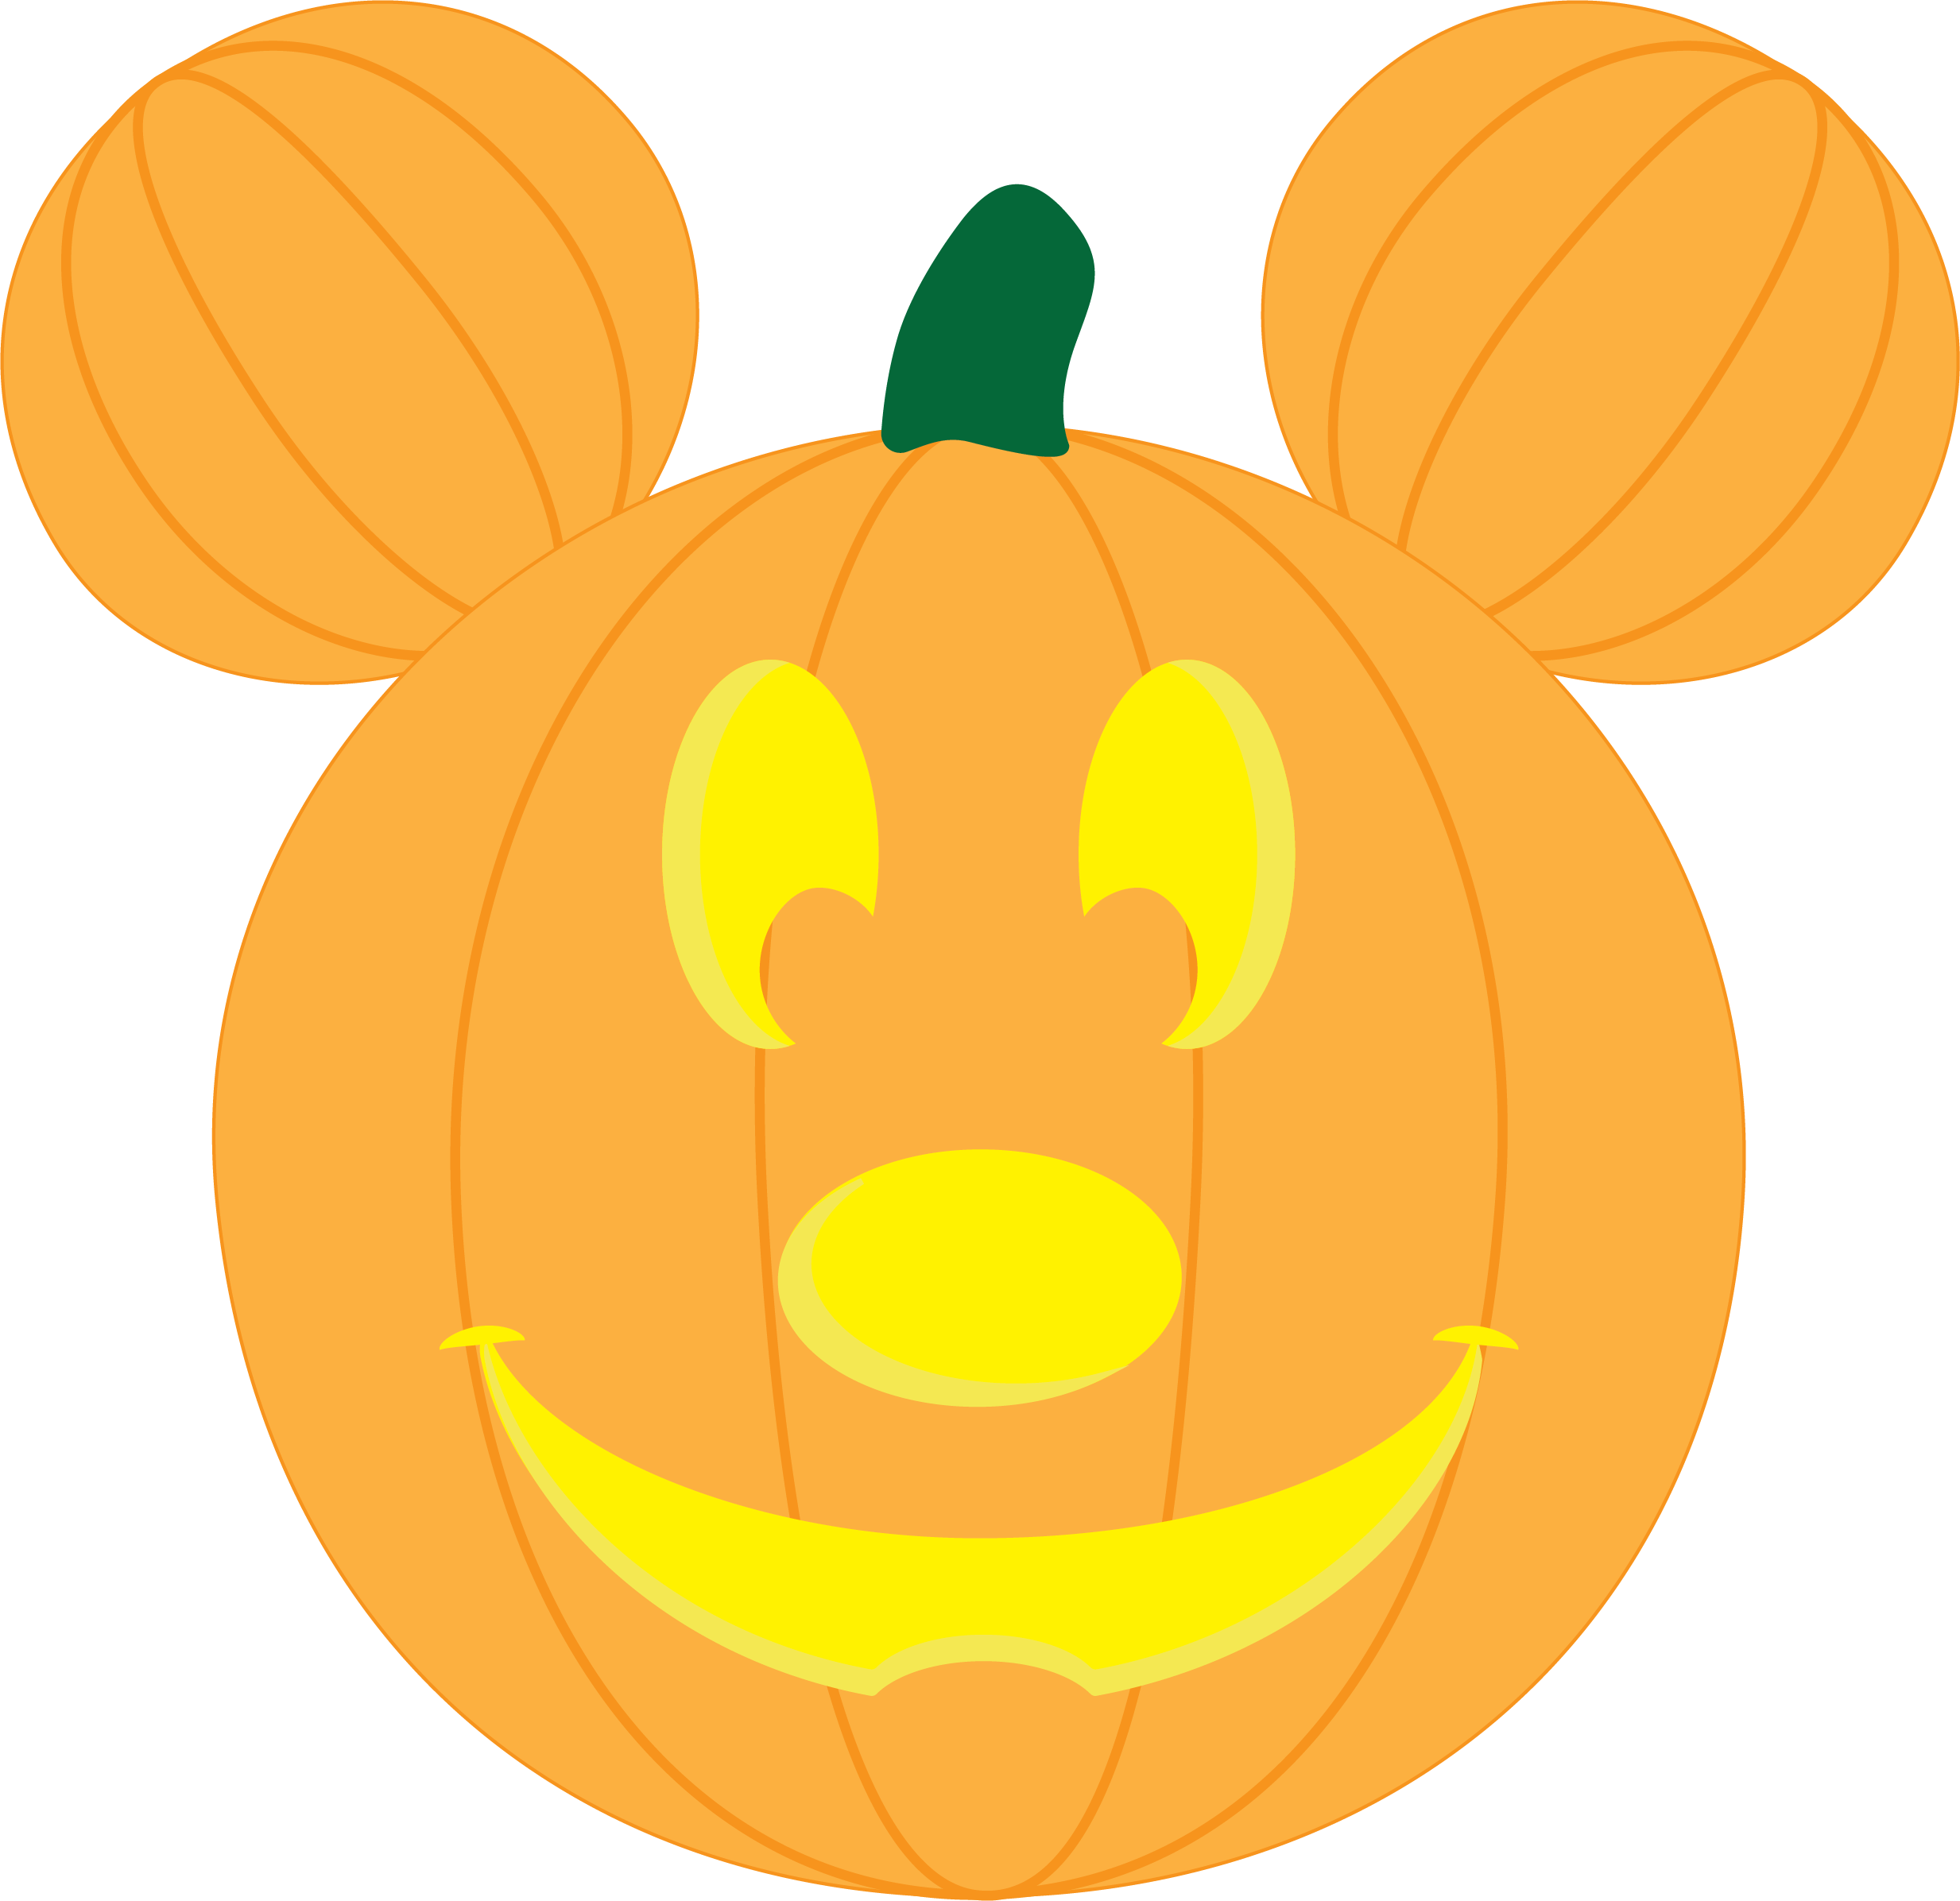 Clipart cutting pumpkin png black and white library DIY Mickey Pumpkin Shirt - Liz on Call png black and white library